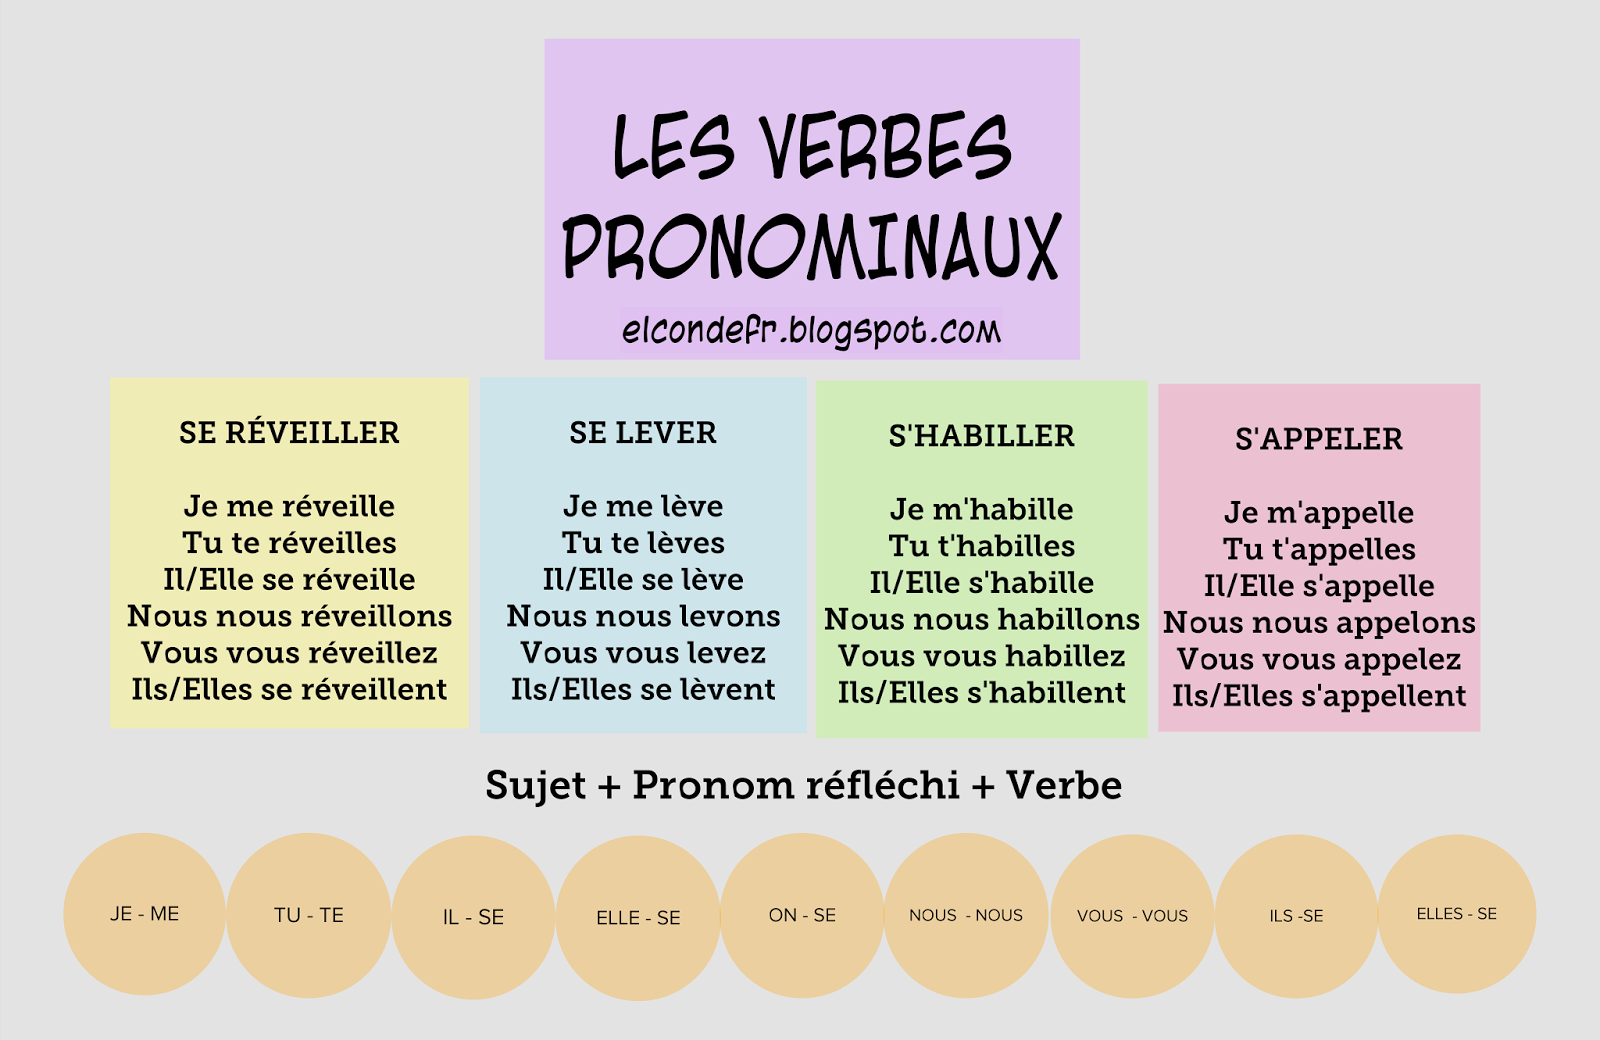 Les Verbes Pronominaux Franse Taal Taal Grammatica